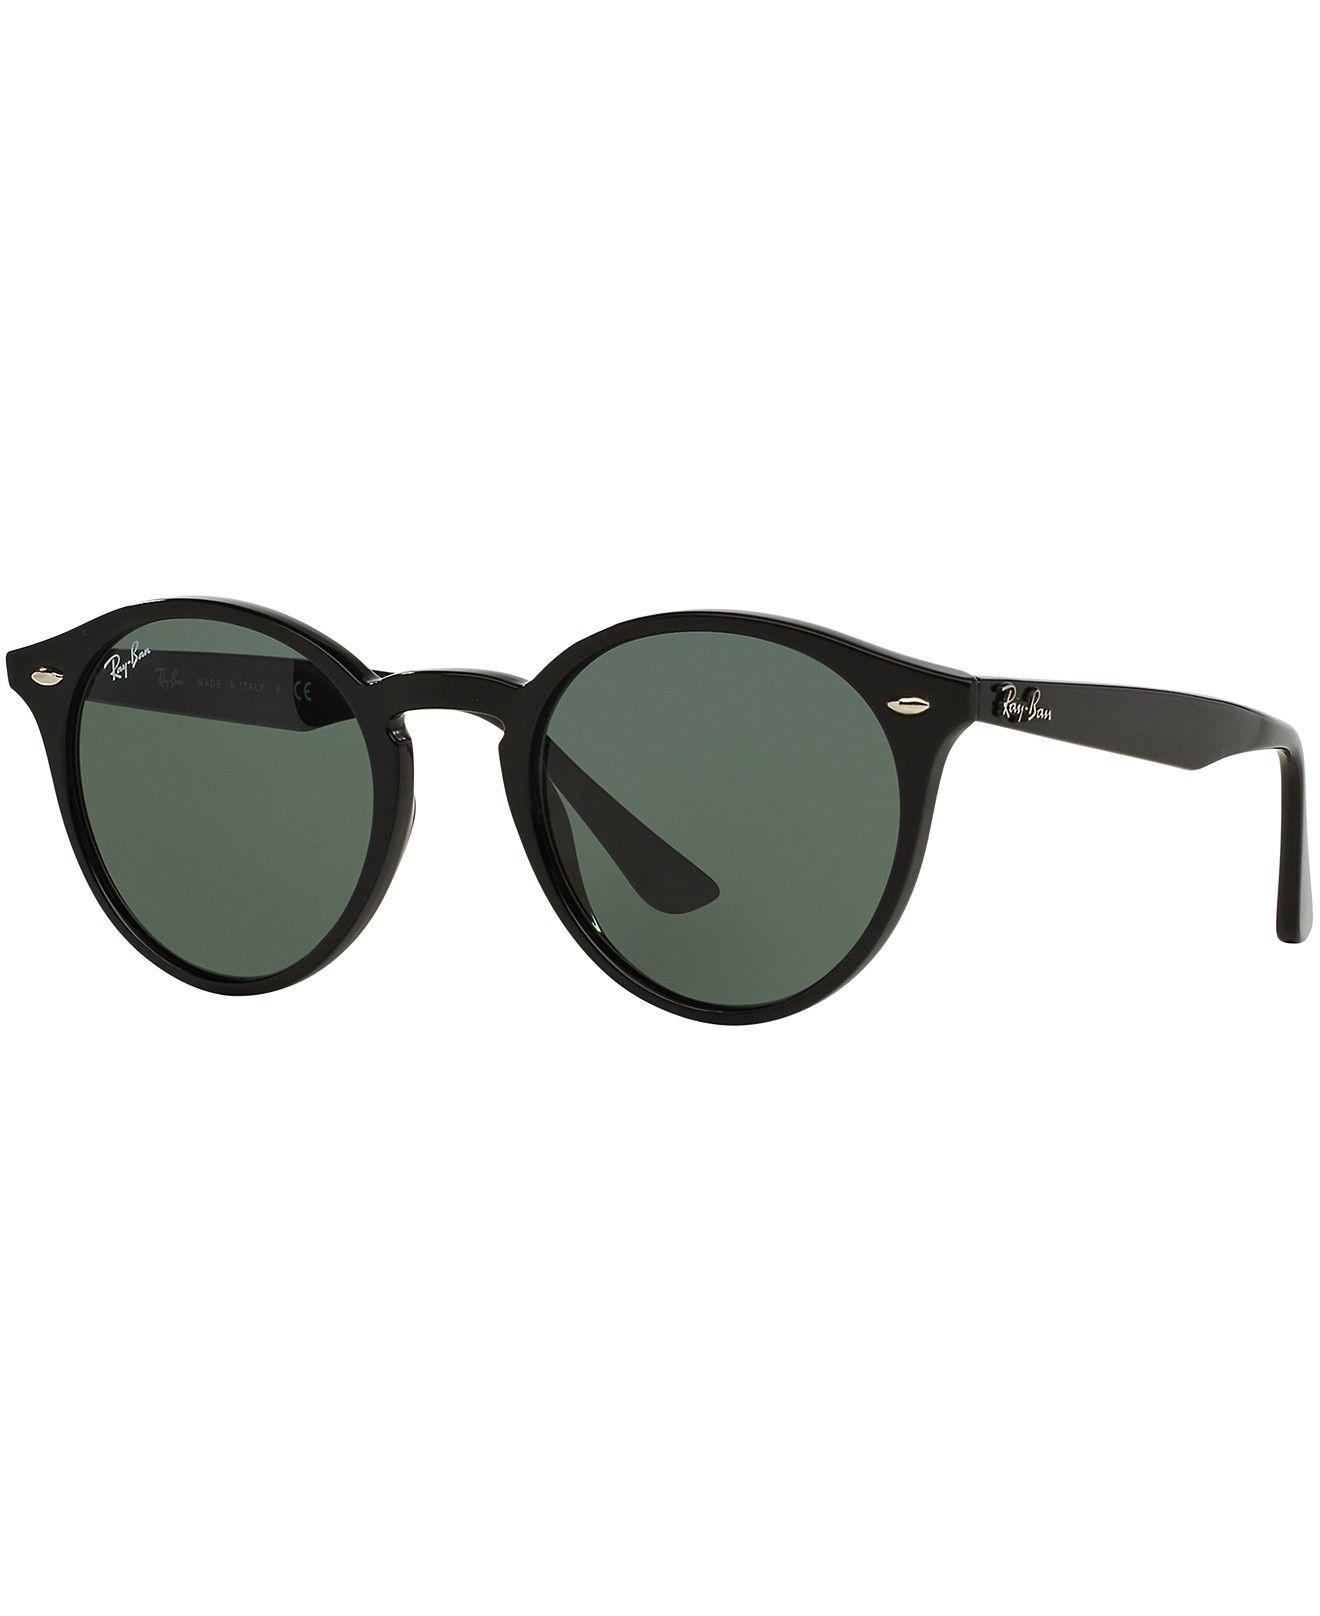 50437cf80d88 Ray-Ban Sunglasses